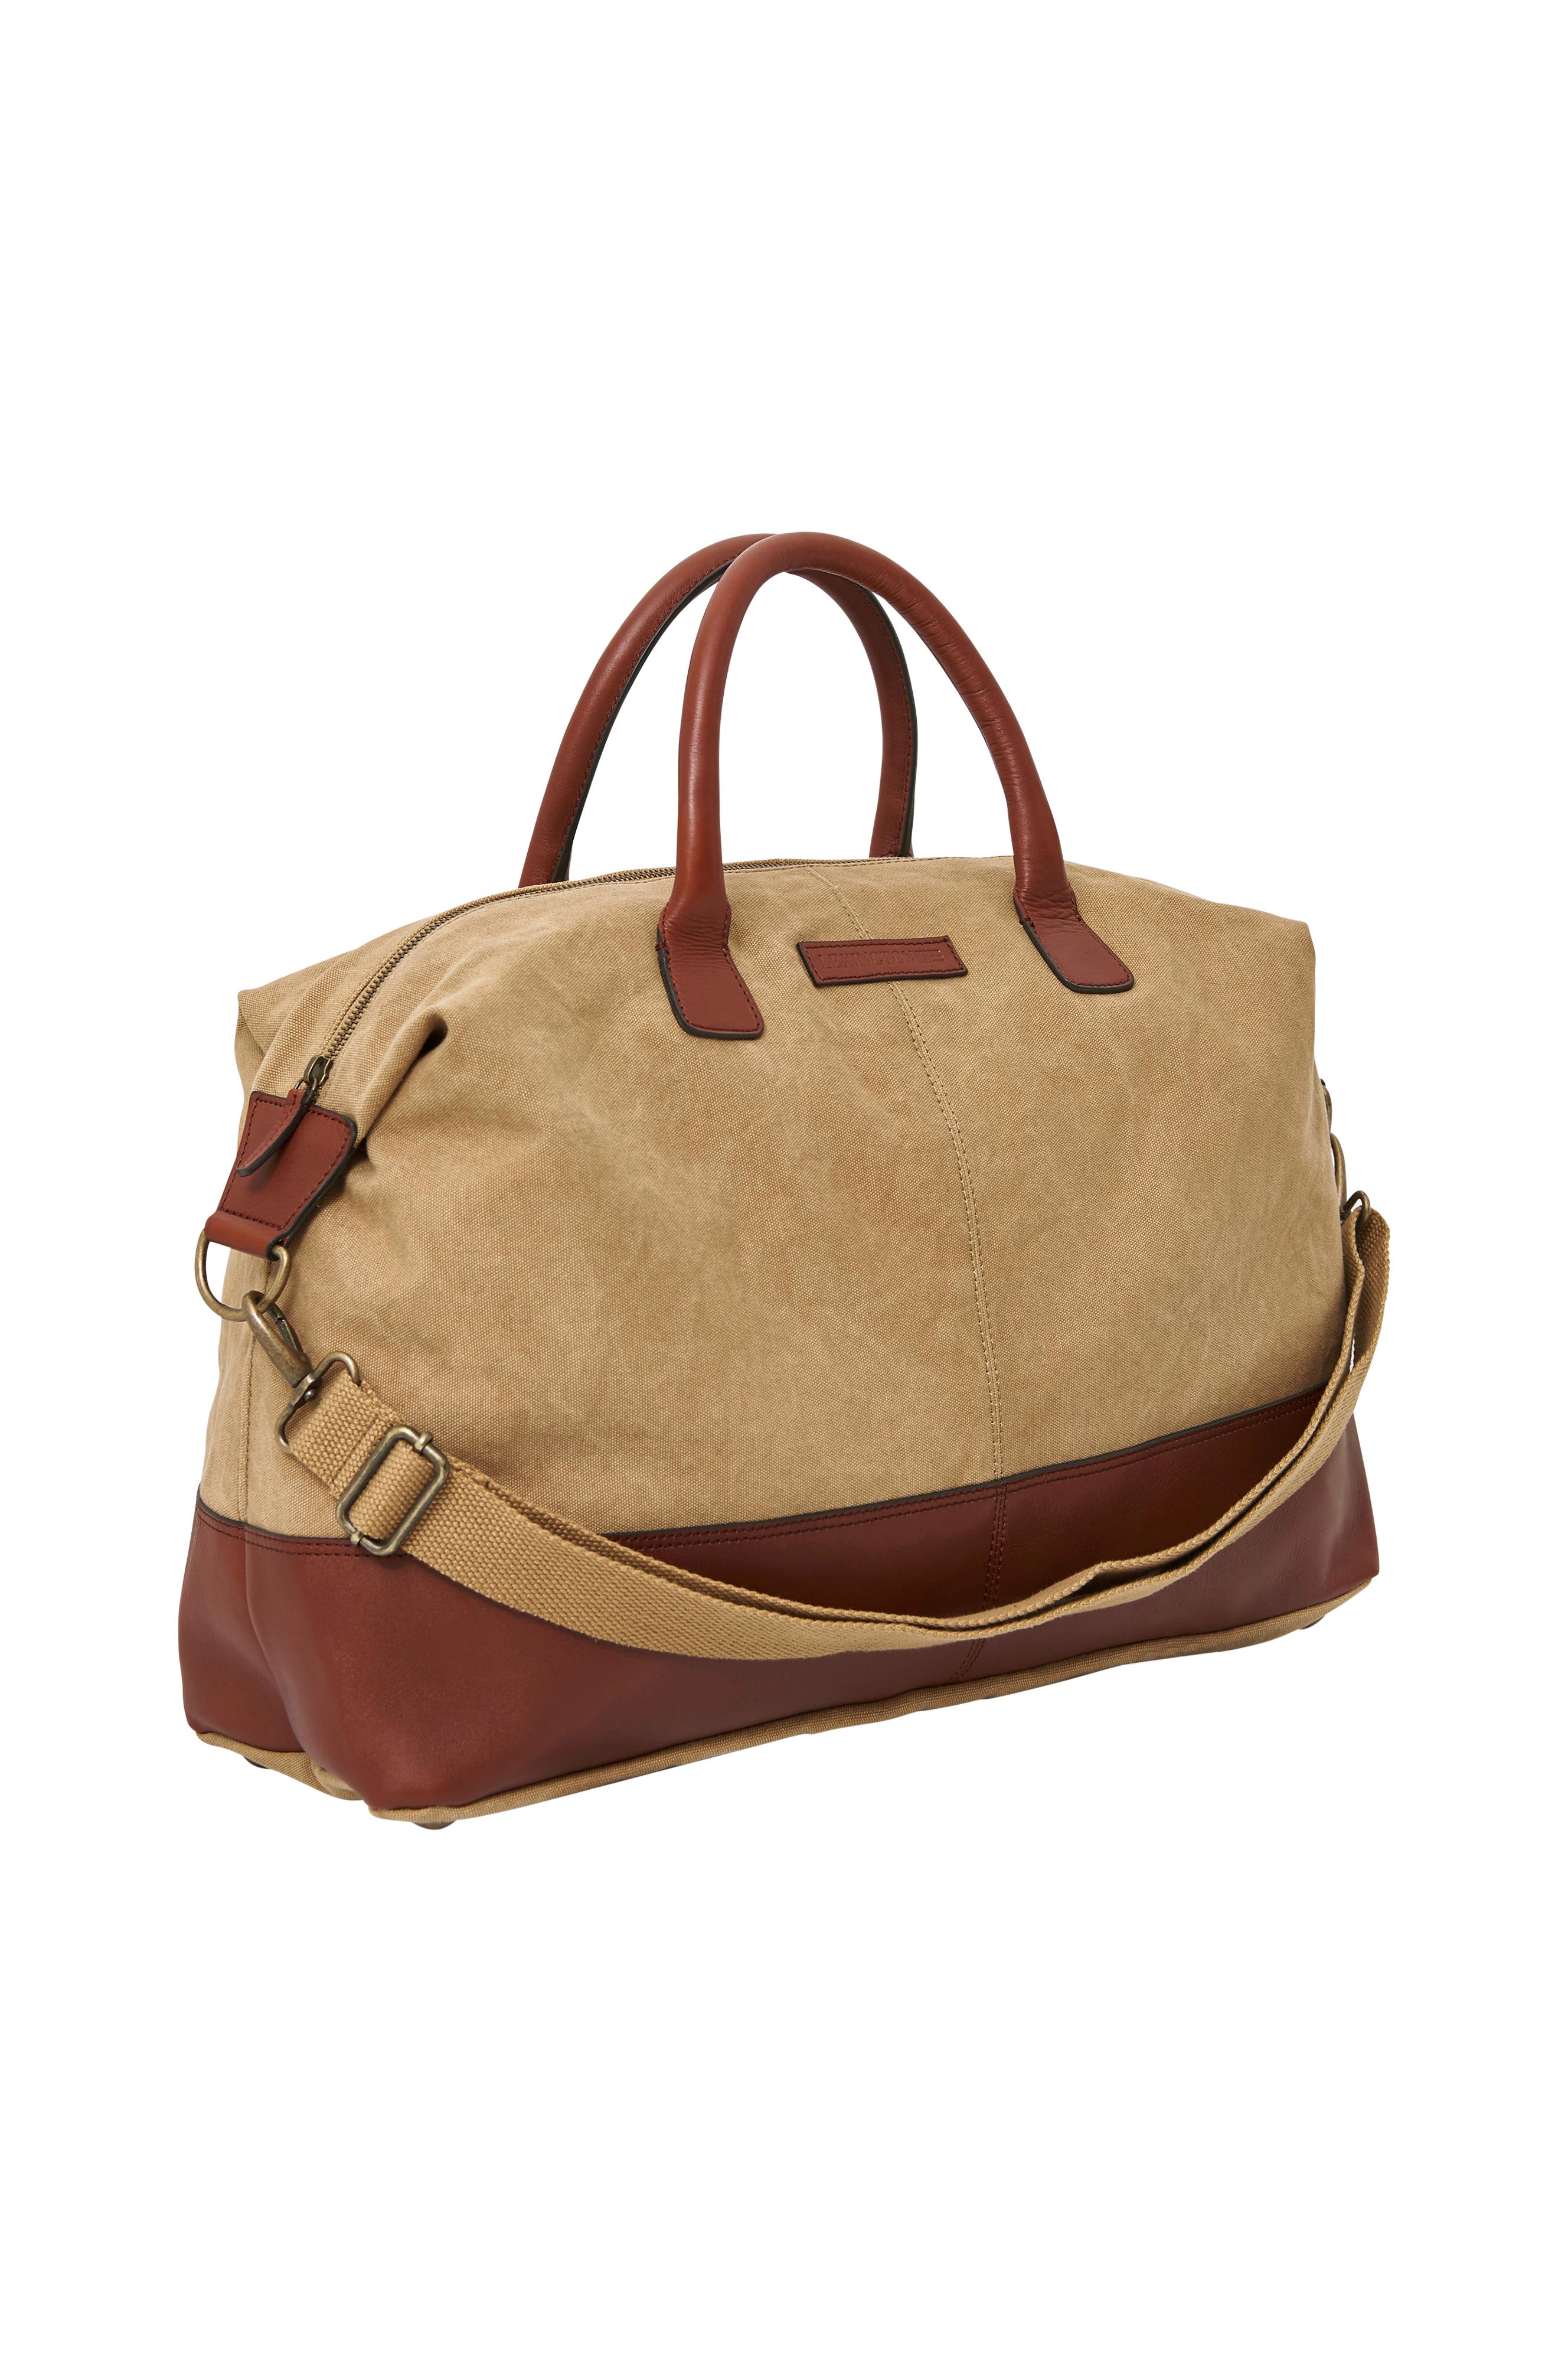 Lexington Sommerville Weekend Bag -laukku - Luonnonväri - Miehet - Ellos.fi 79985e79ee